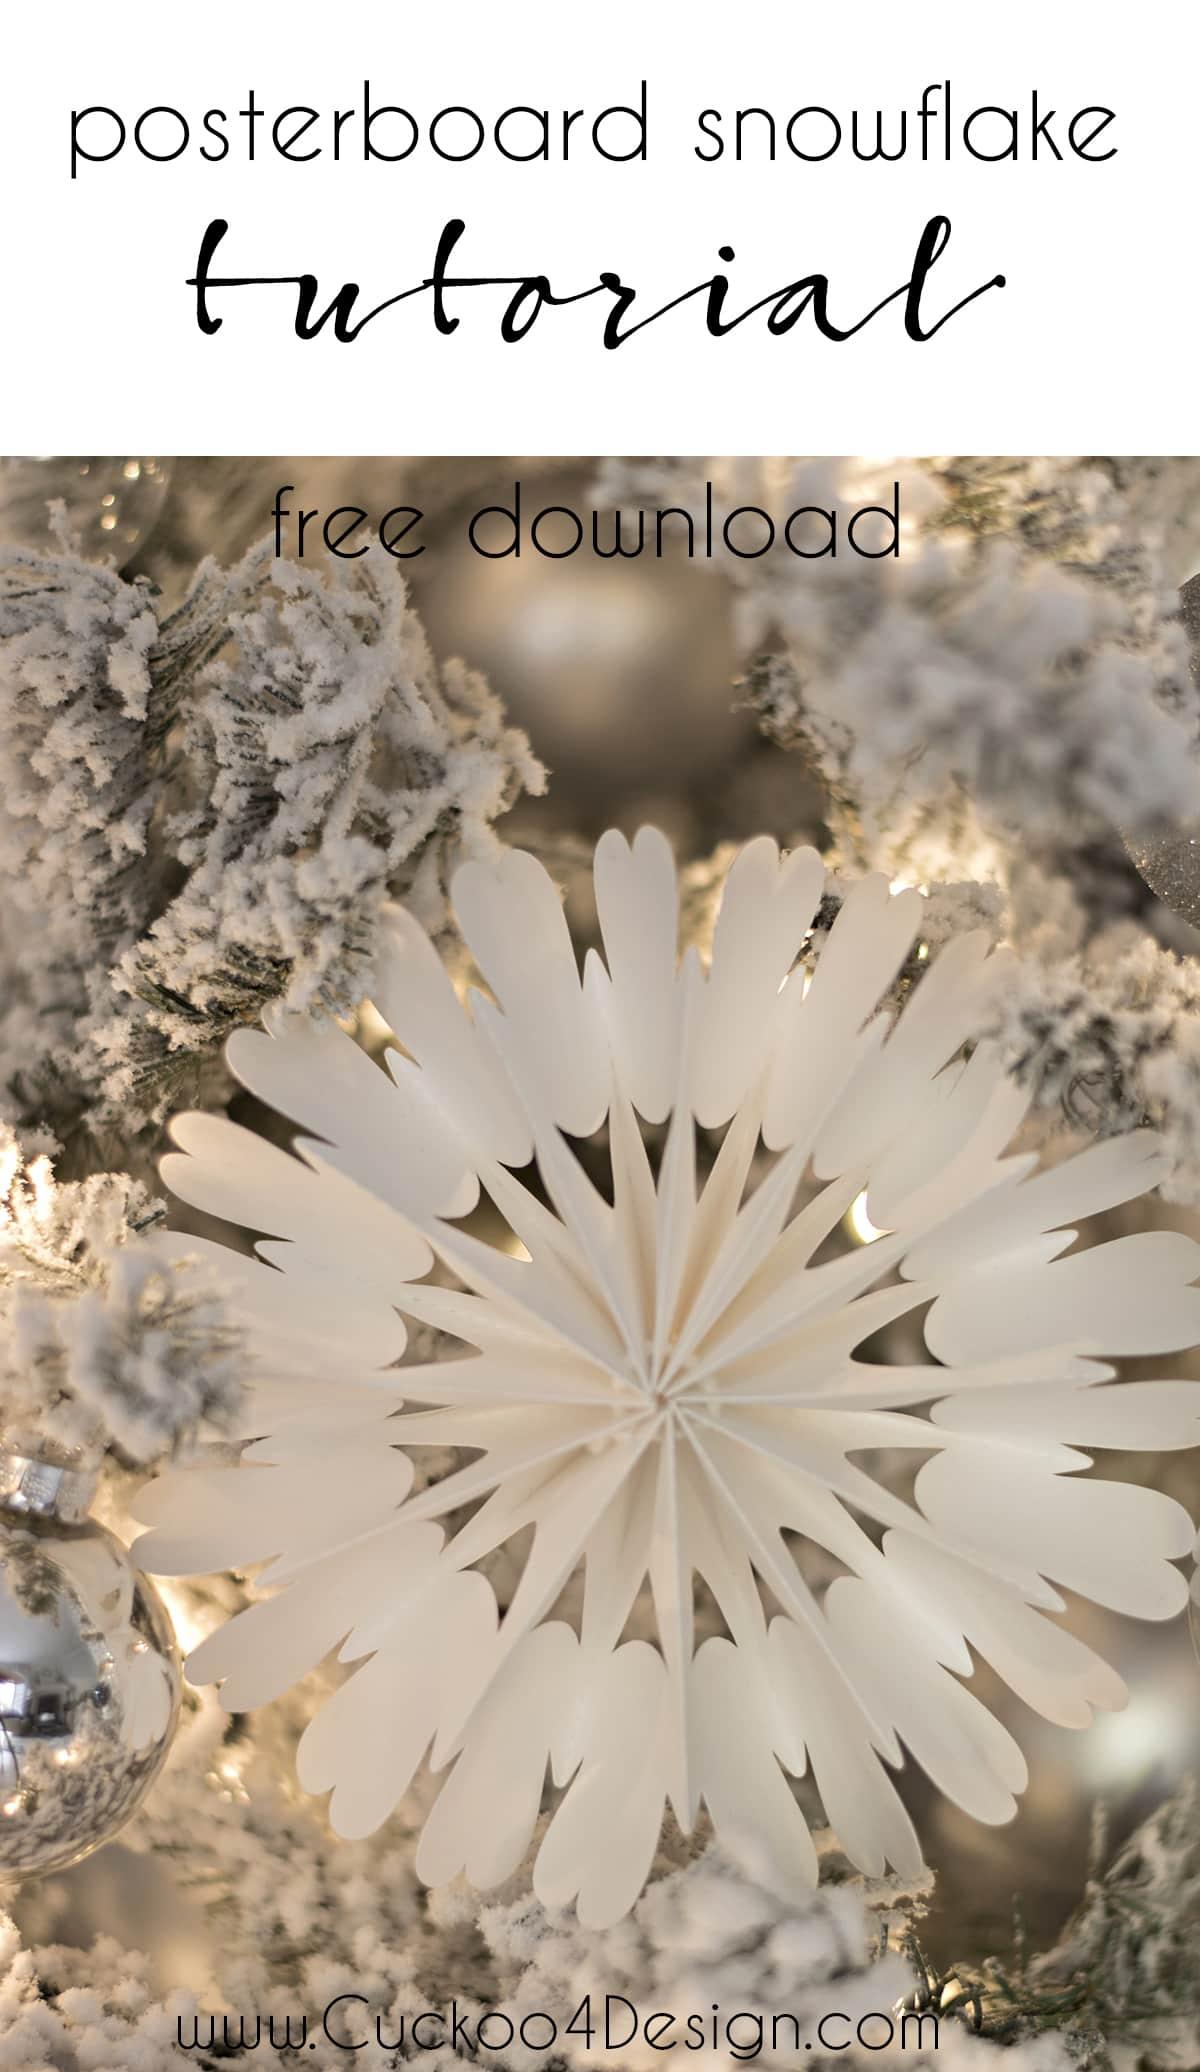 diy_cardboard_snowflake_ornament_free-download_cuckoo4design